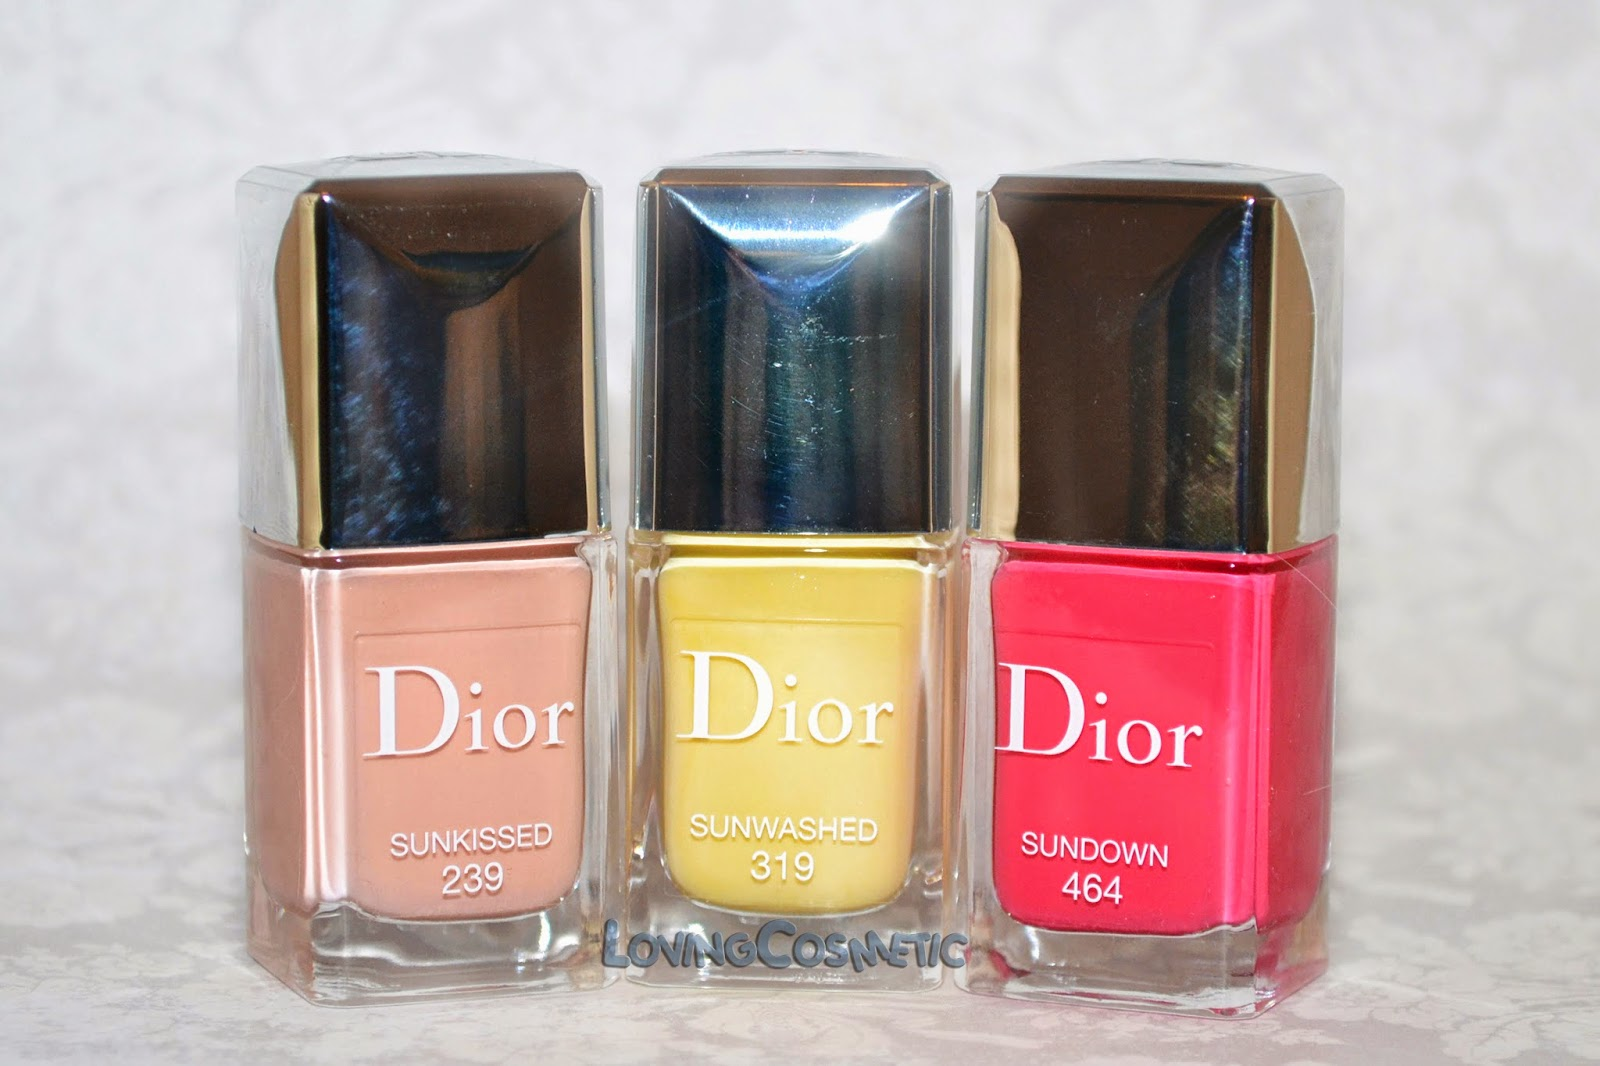 Dior Tie & Dye coleccion collection 2015 summer verano vernis sunwashed 319 sunkissed 239 sundown 464 tie dye top coar swatch swatches